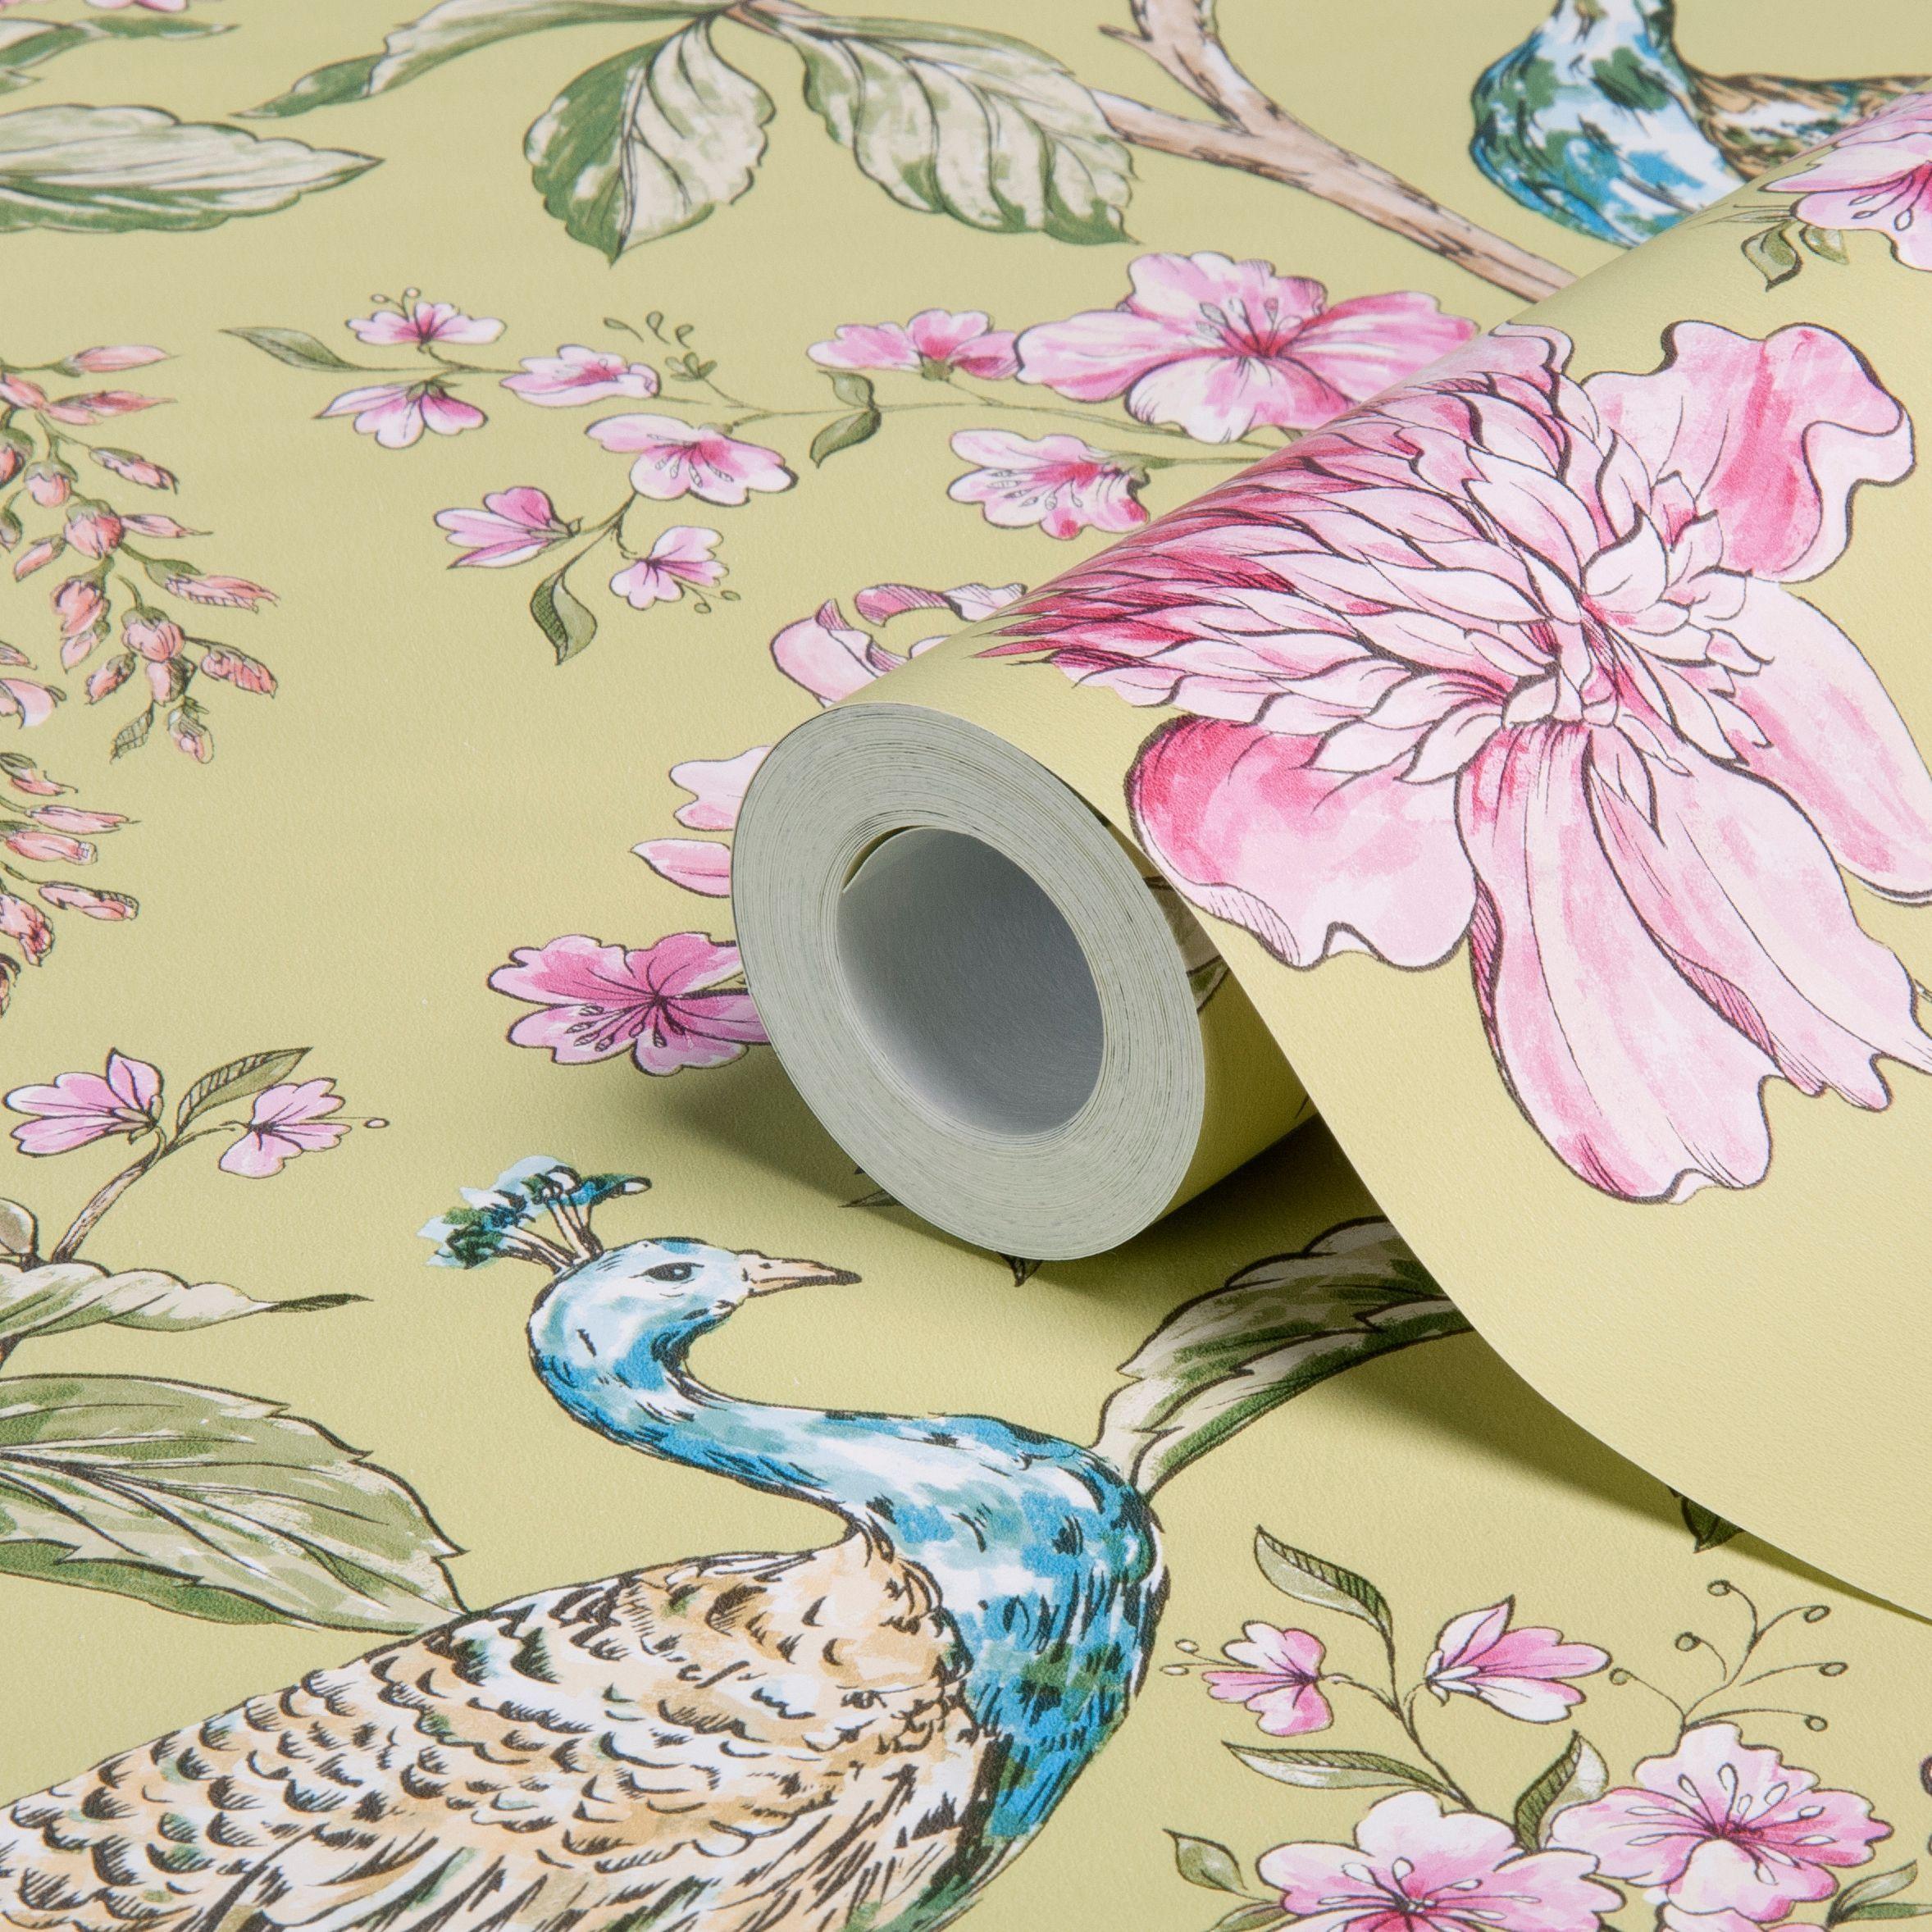 Hibiscus Citrus Peacock Floral Wallpaper Departments DIY